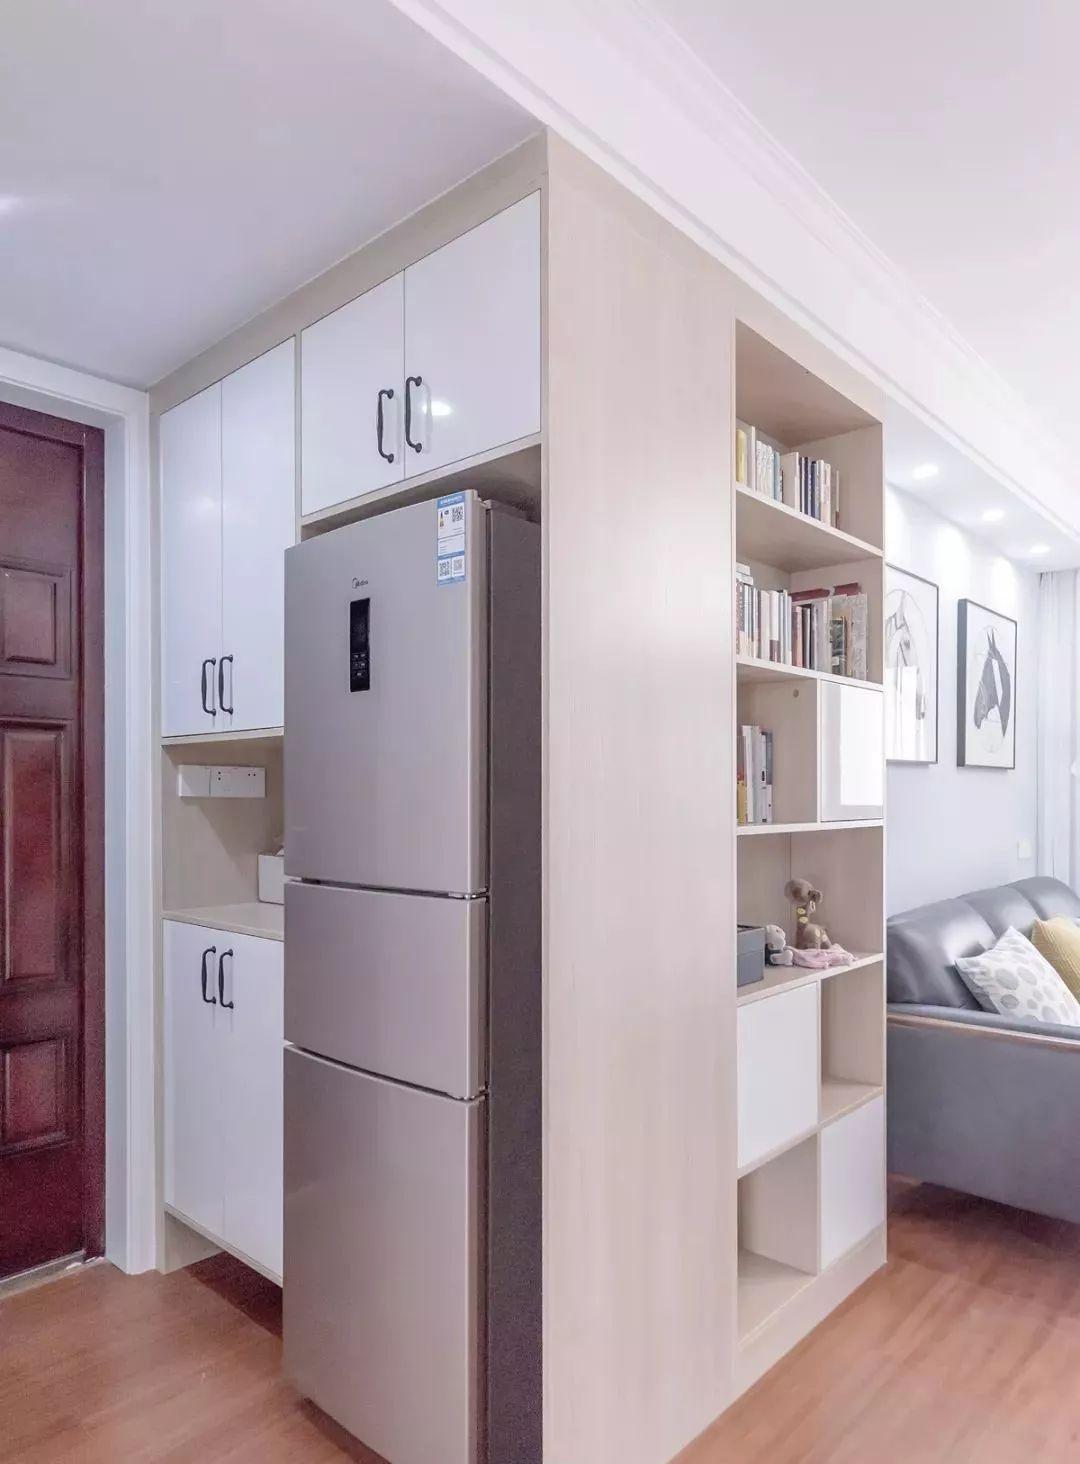 80�O二室二厅还挤出一个小书房,小清新的蓝色调怎么也看不腻!